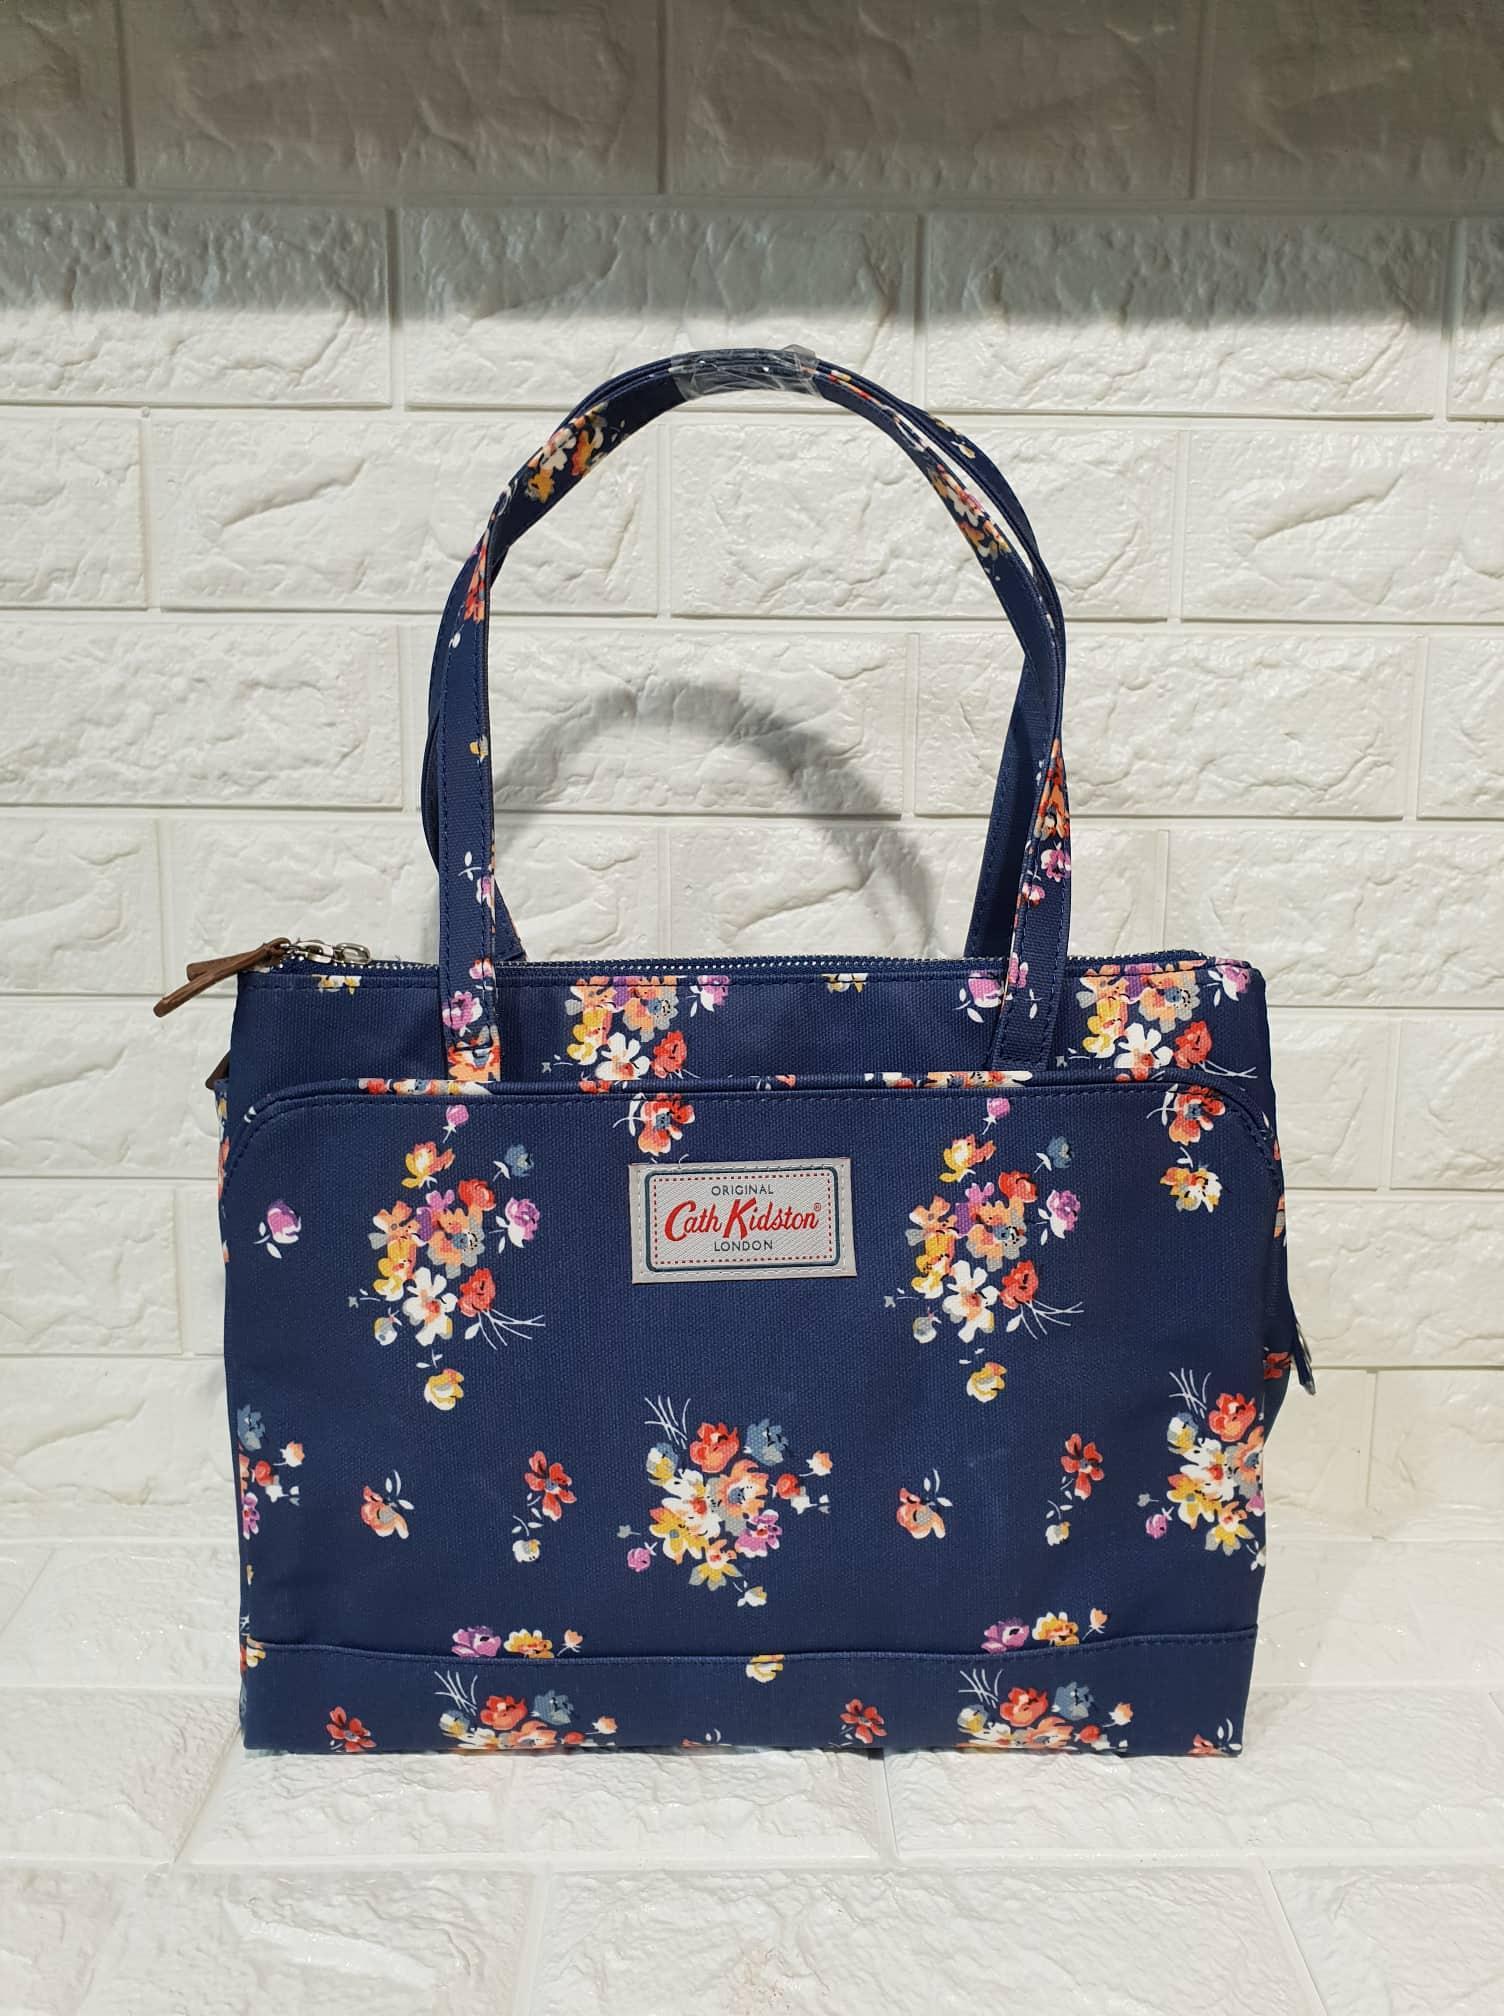 33209c7761 Cath Kidston Philippines  Cath Kidston price list - Backpacks ...